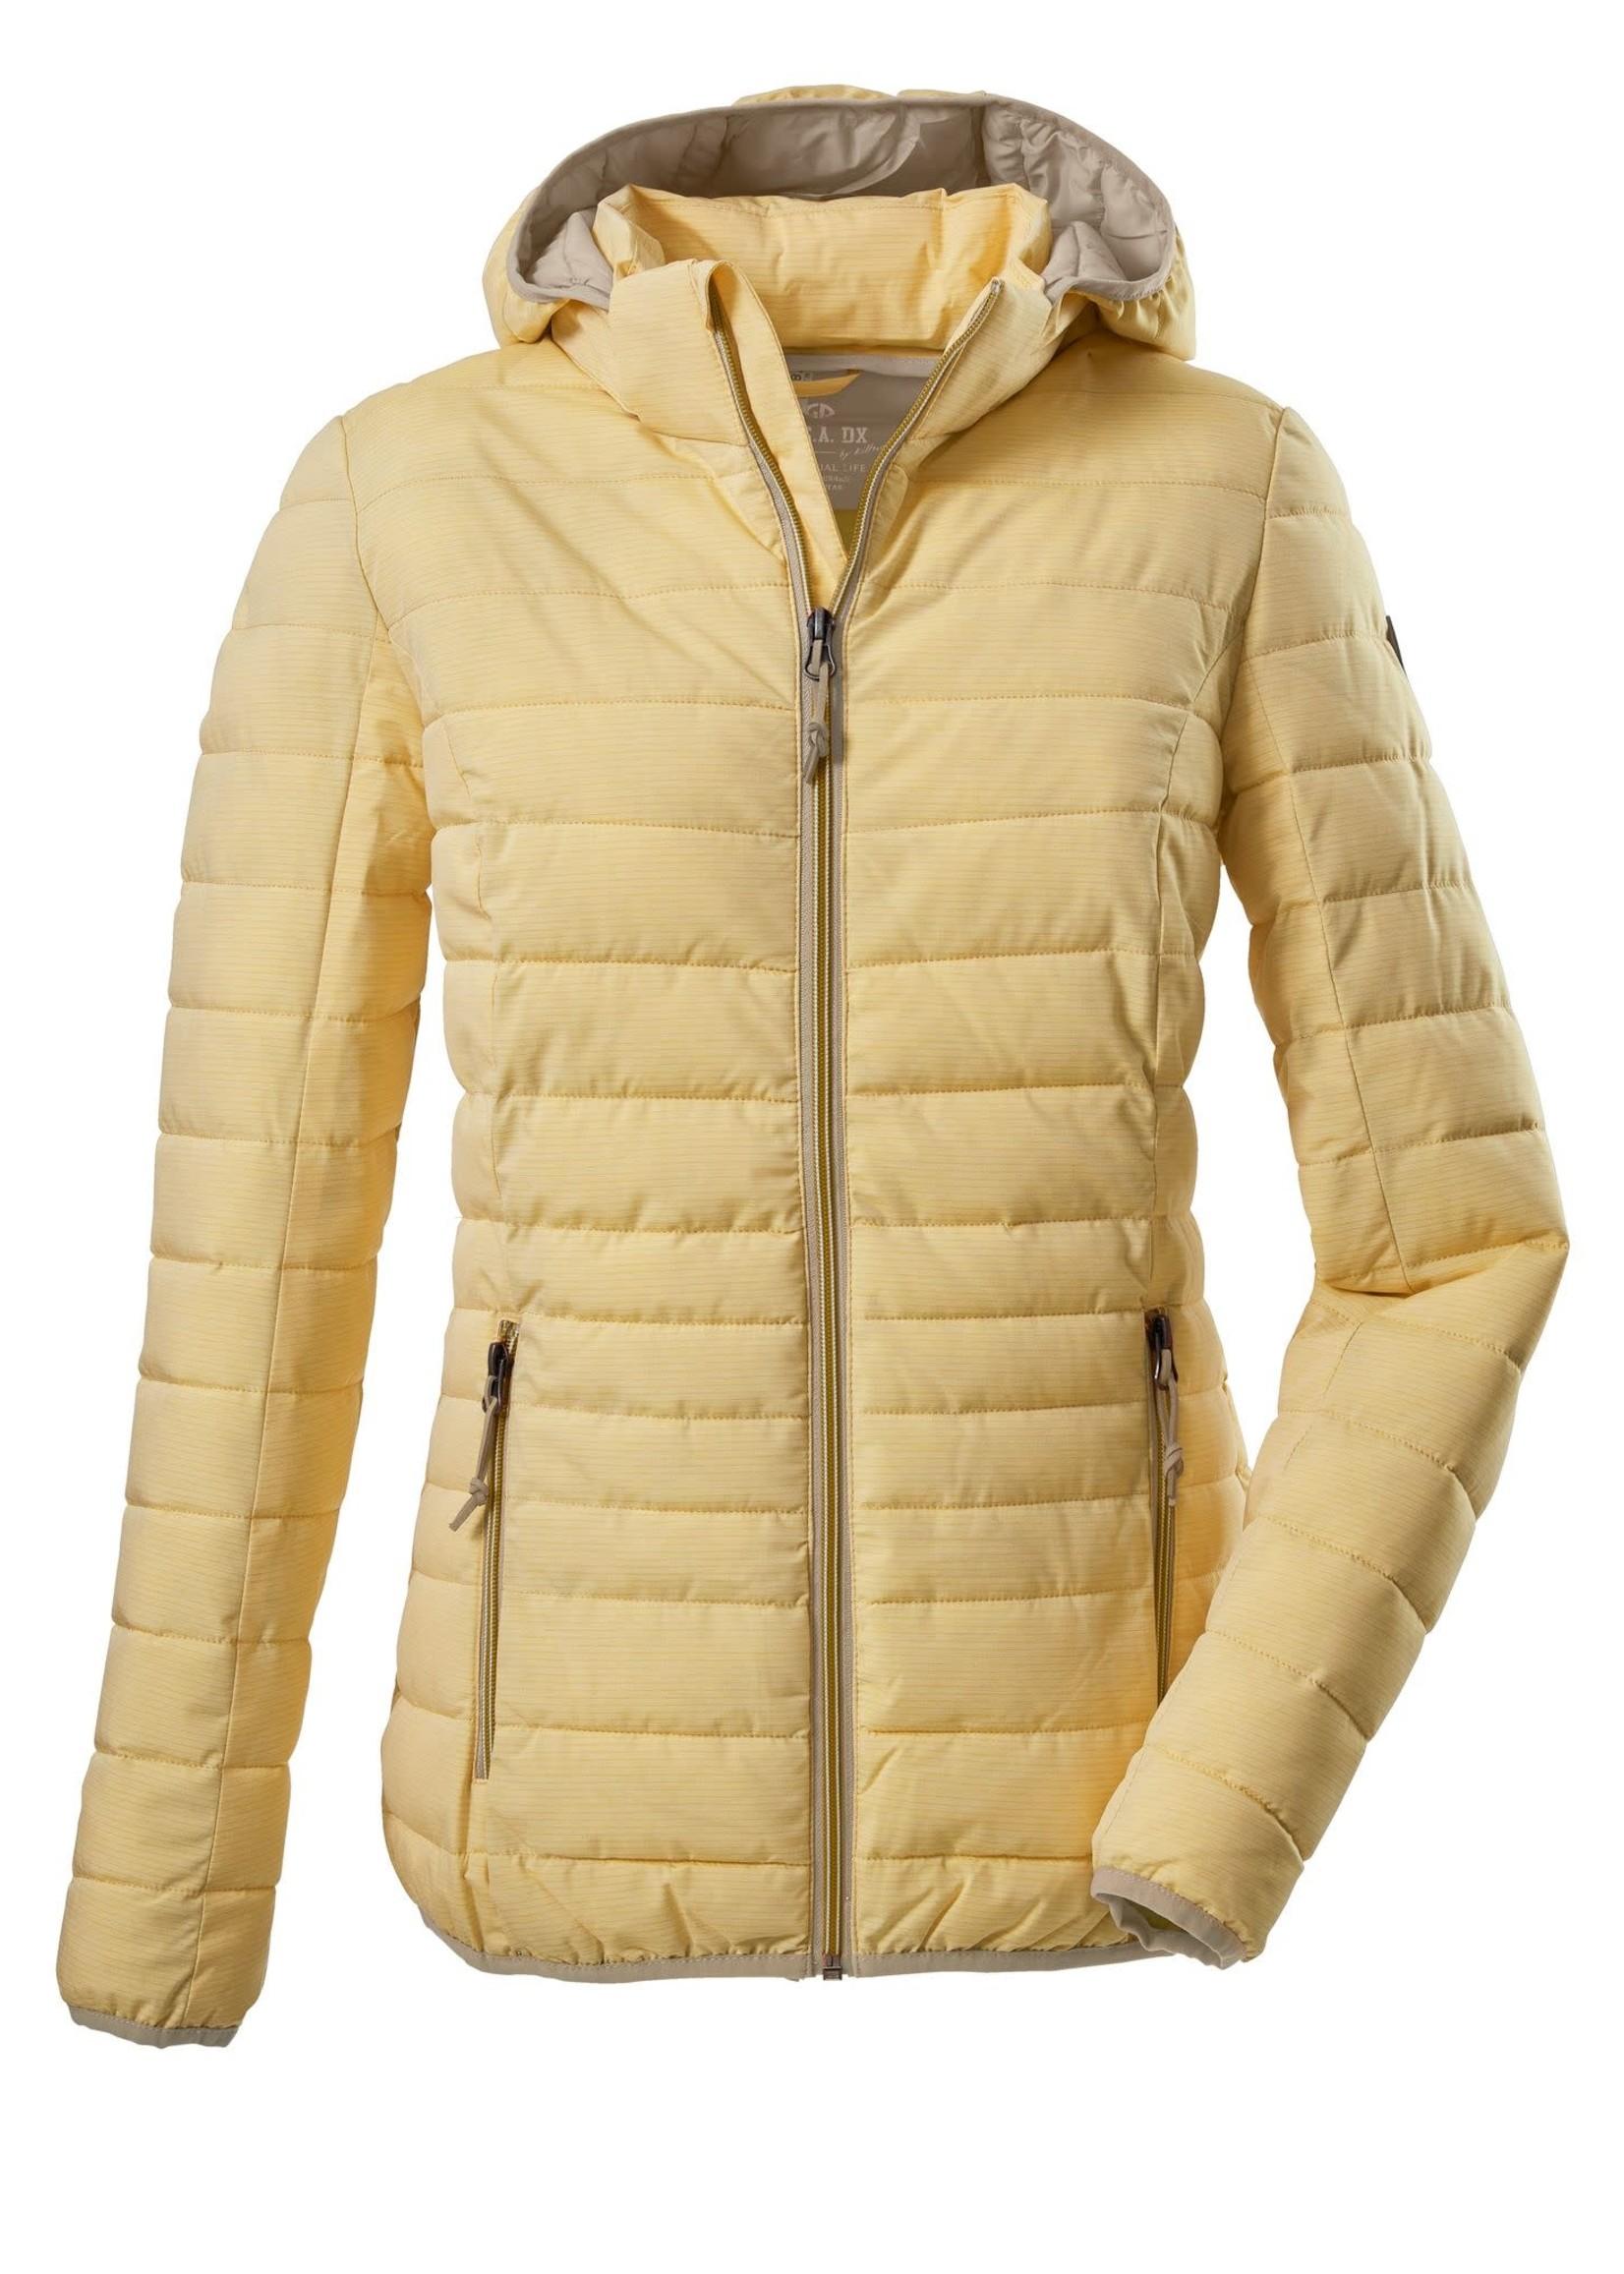 GIGA Casual Functional Jacket in Down Look with Zip-off Hood 34313